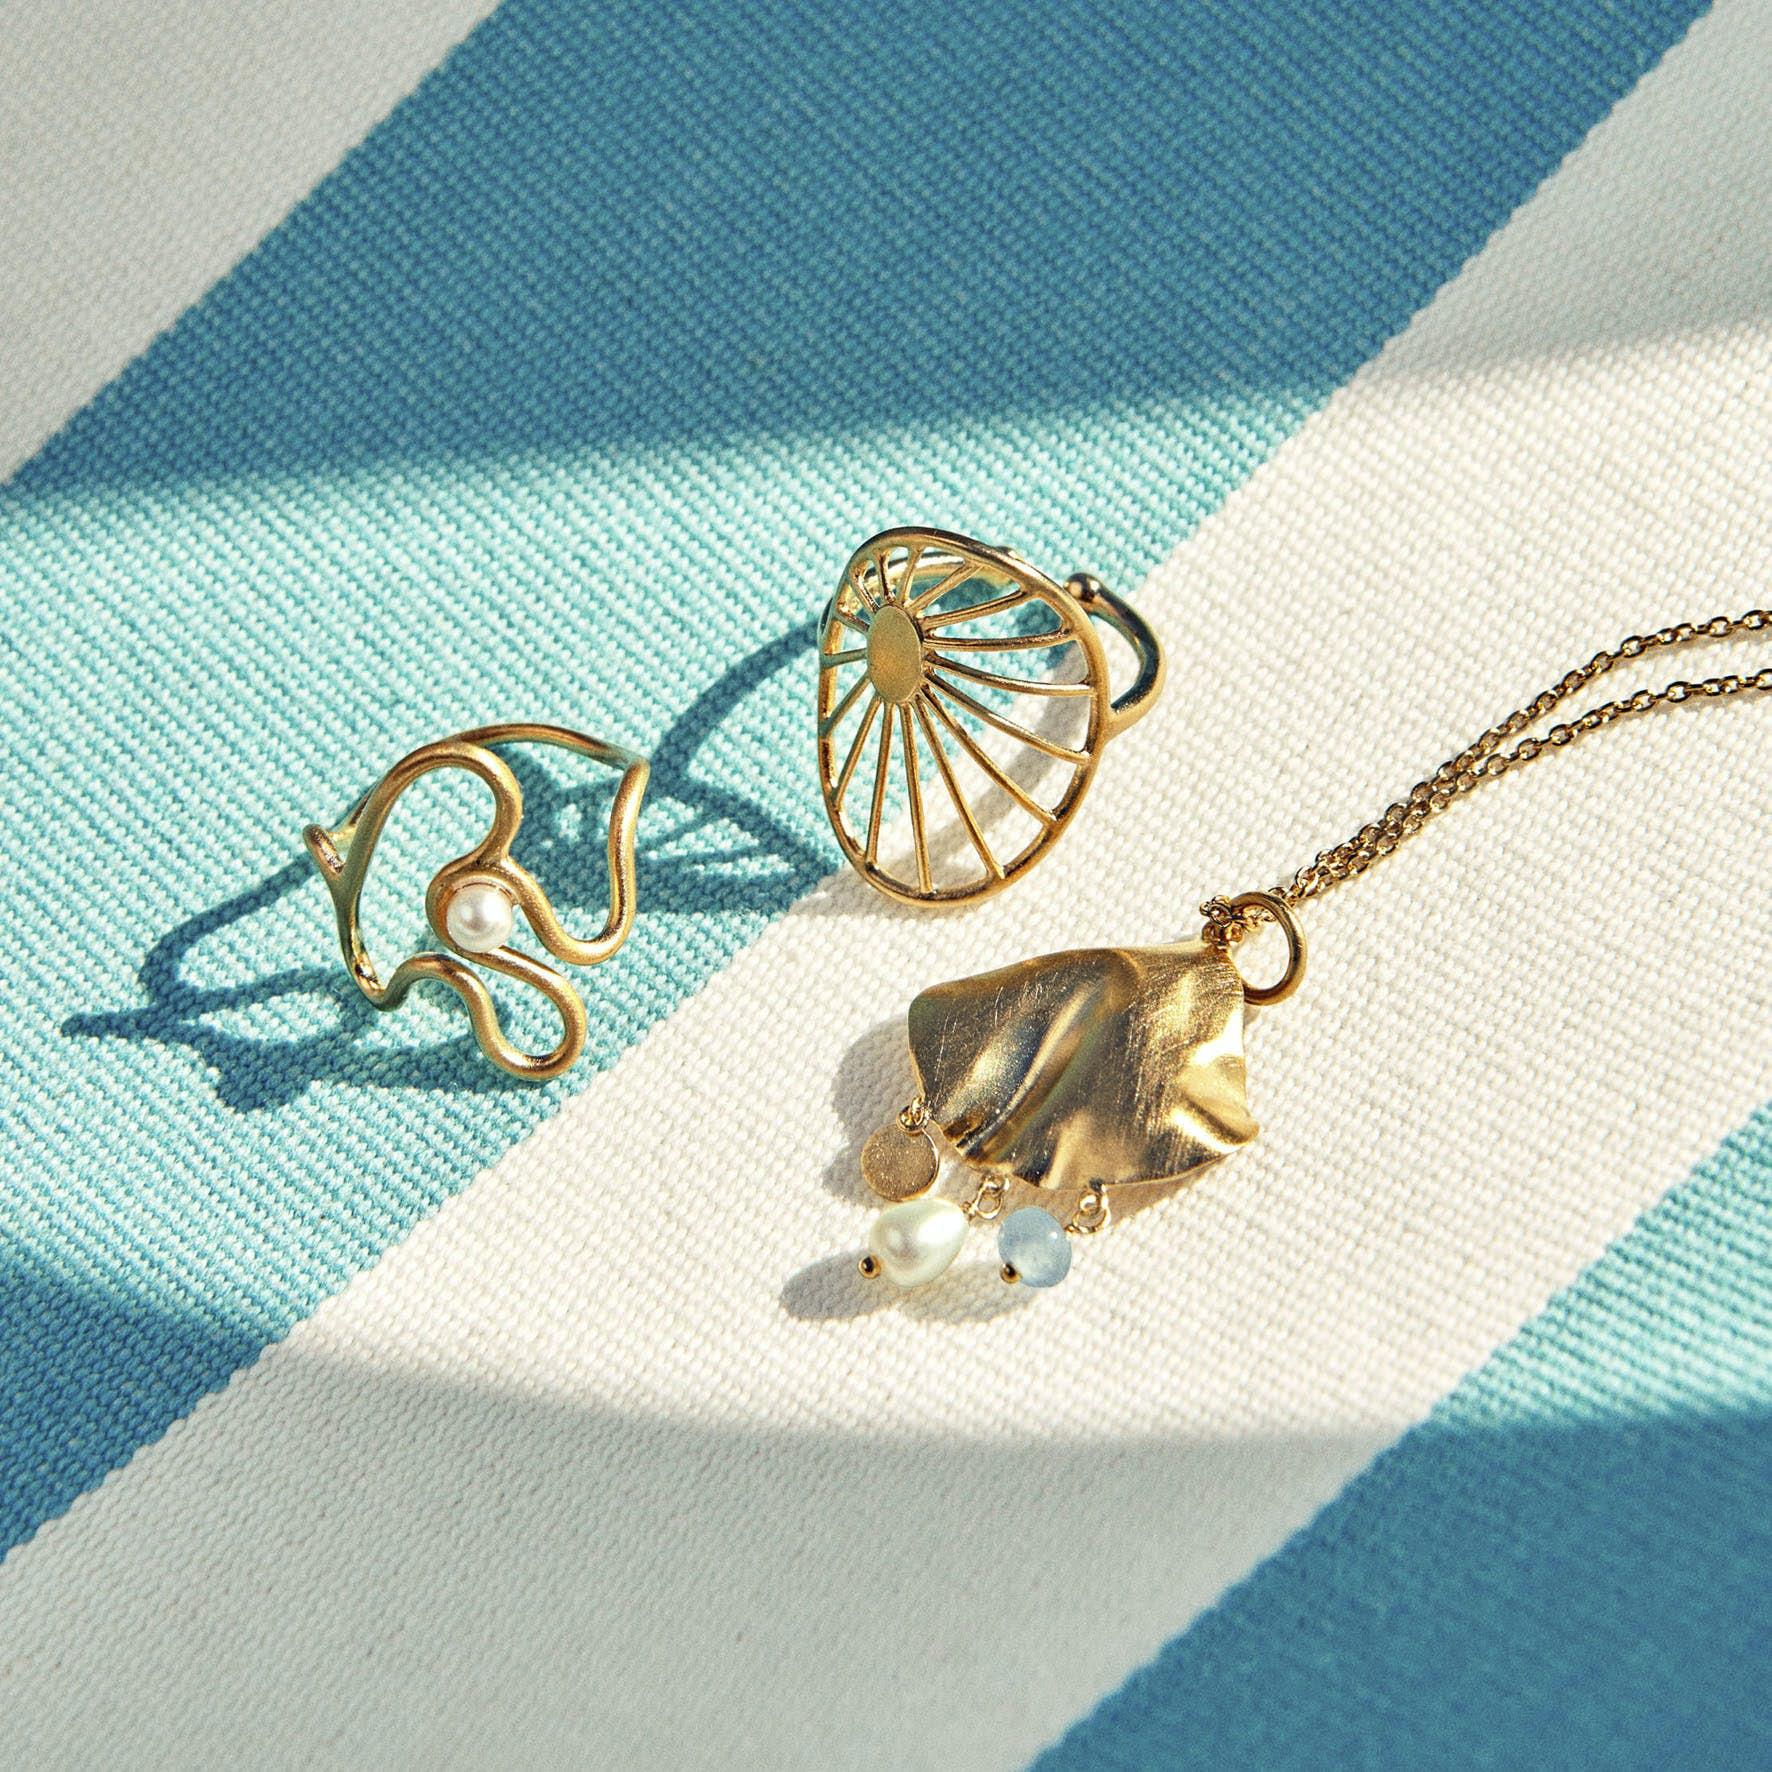 Sea Treasure Necklace von Pernille Corydon in Vergoldet-Silber Sterling 925